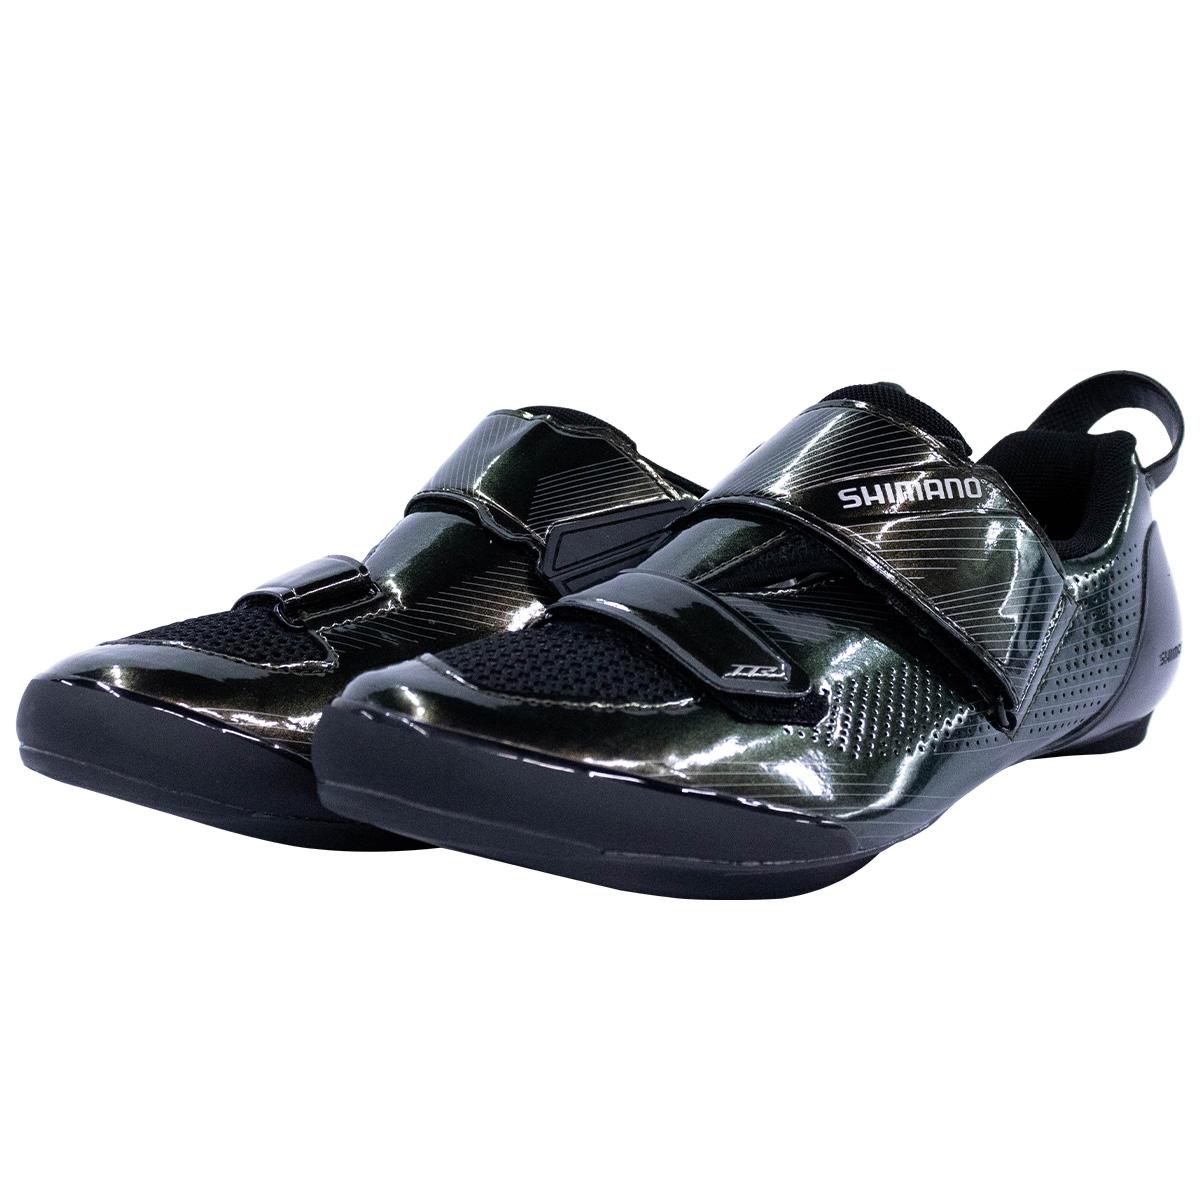 SAPATILHA SHIMANO SH-TR901 TRIATLO BLACK PEARL